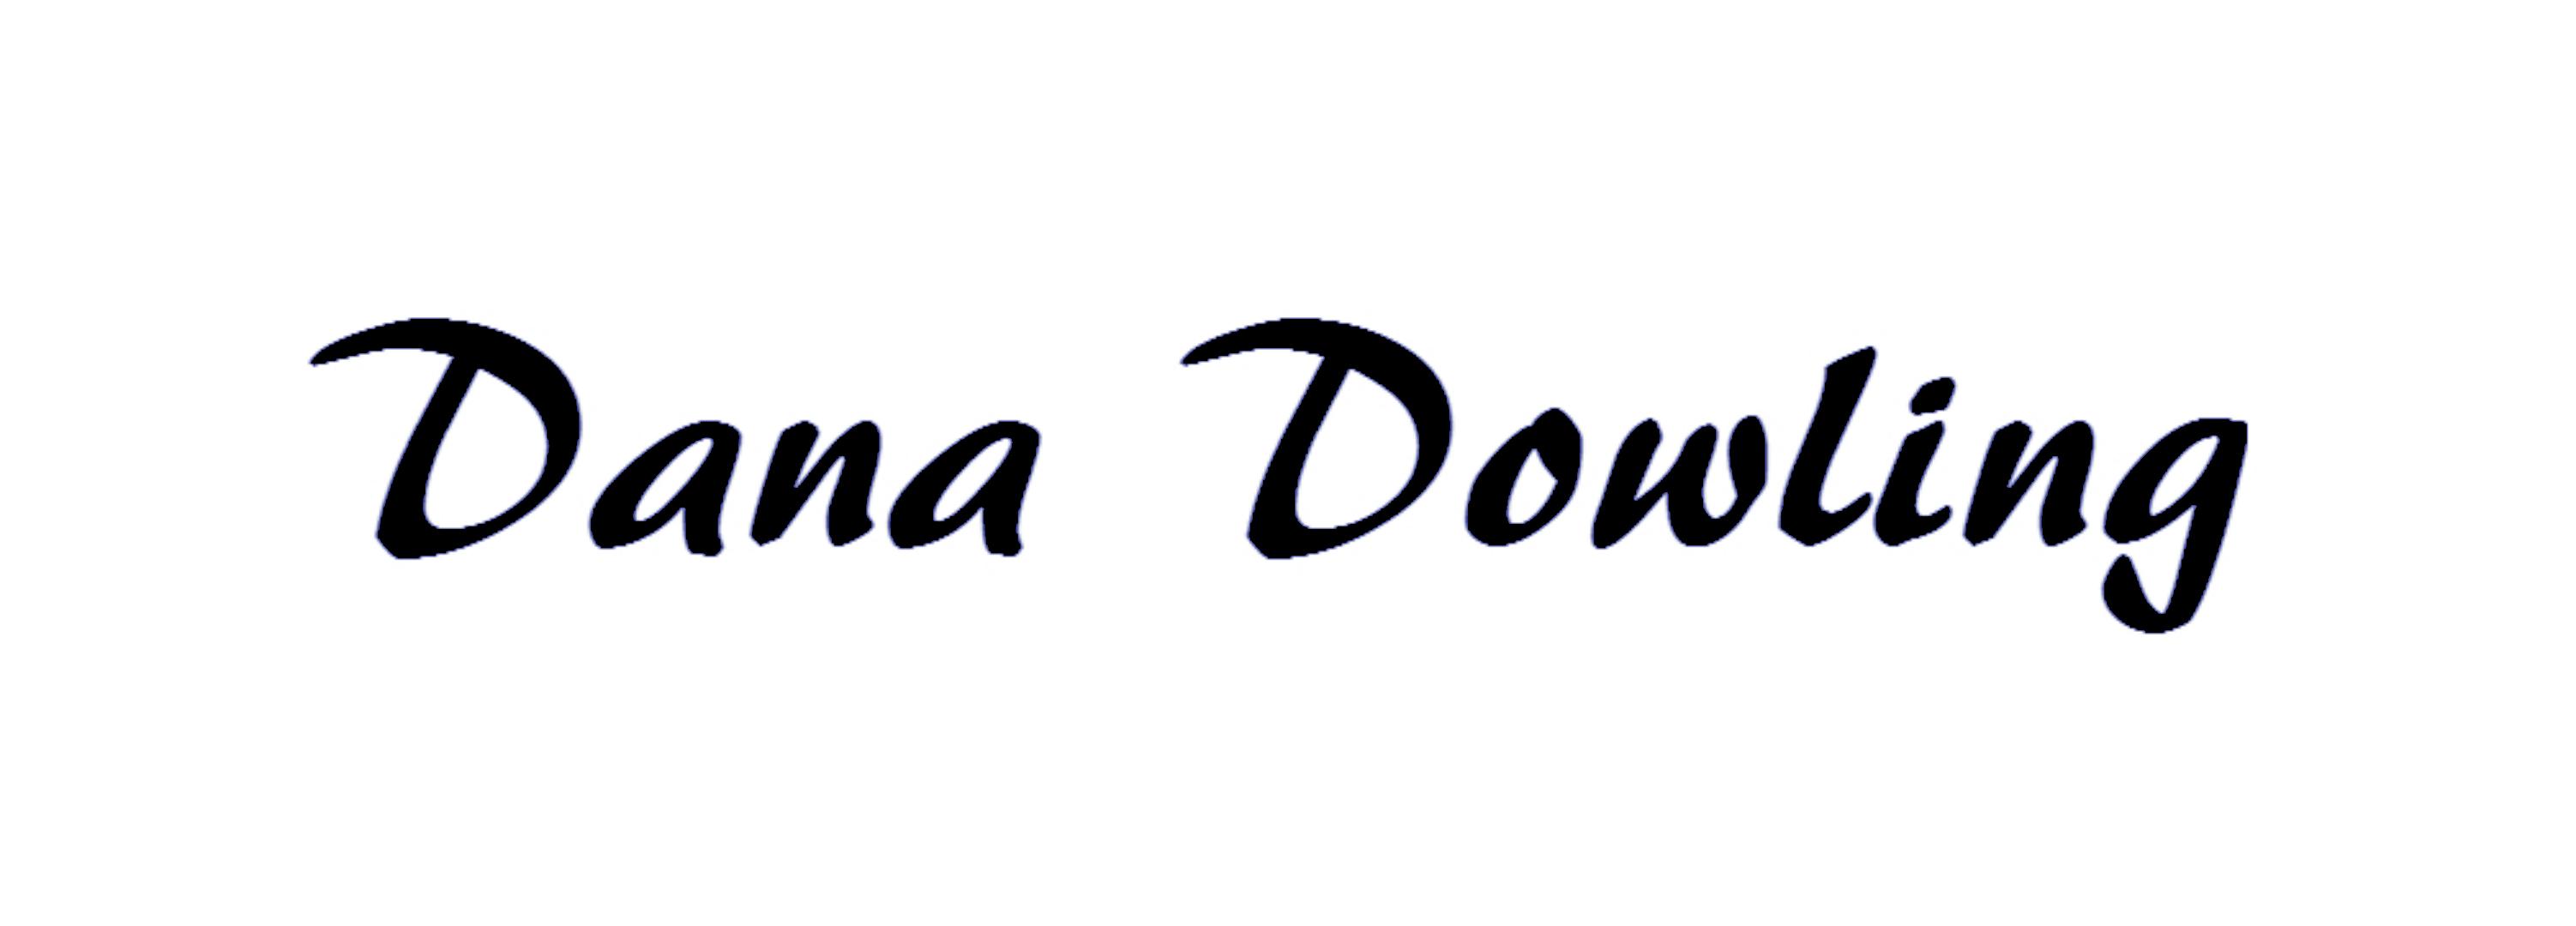 Dana Dowling's Signature